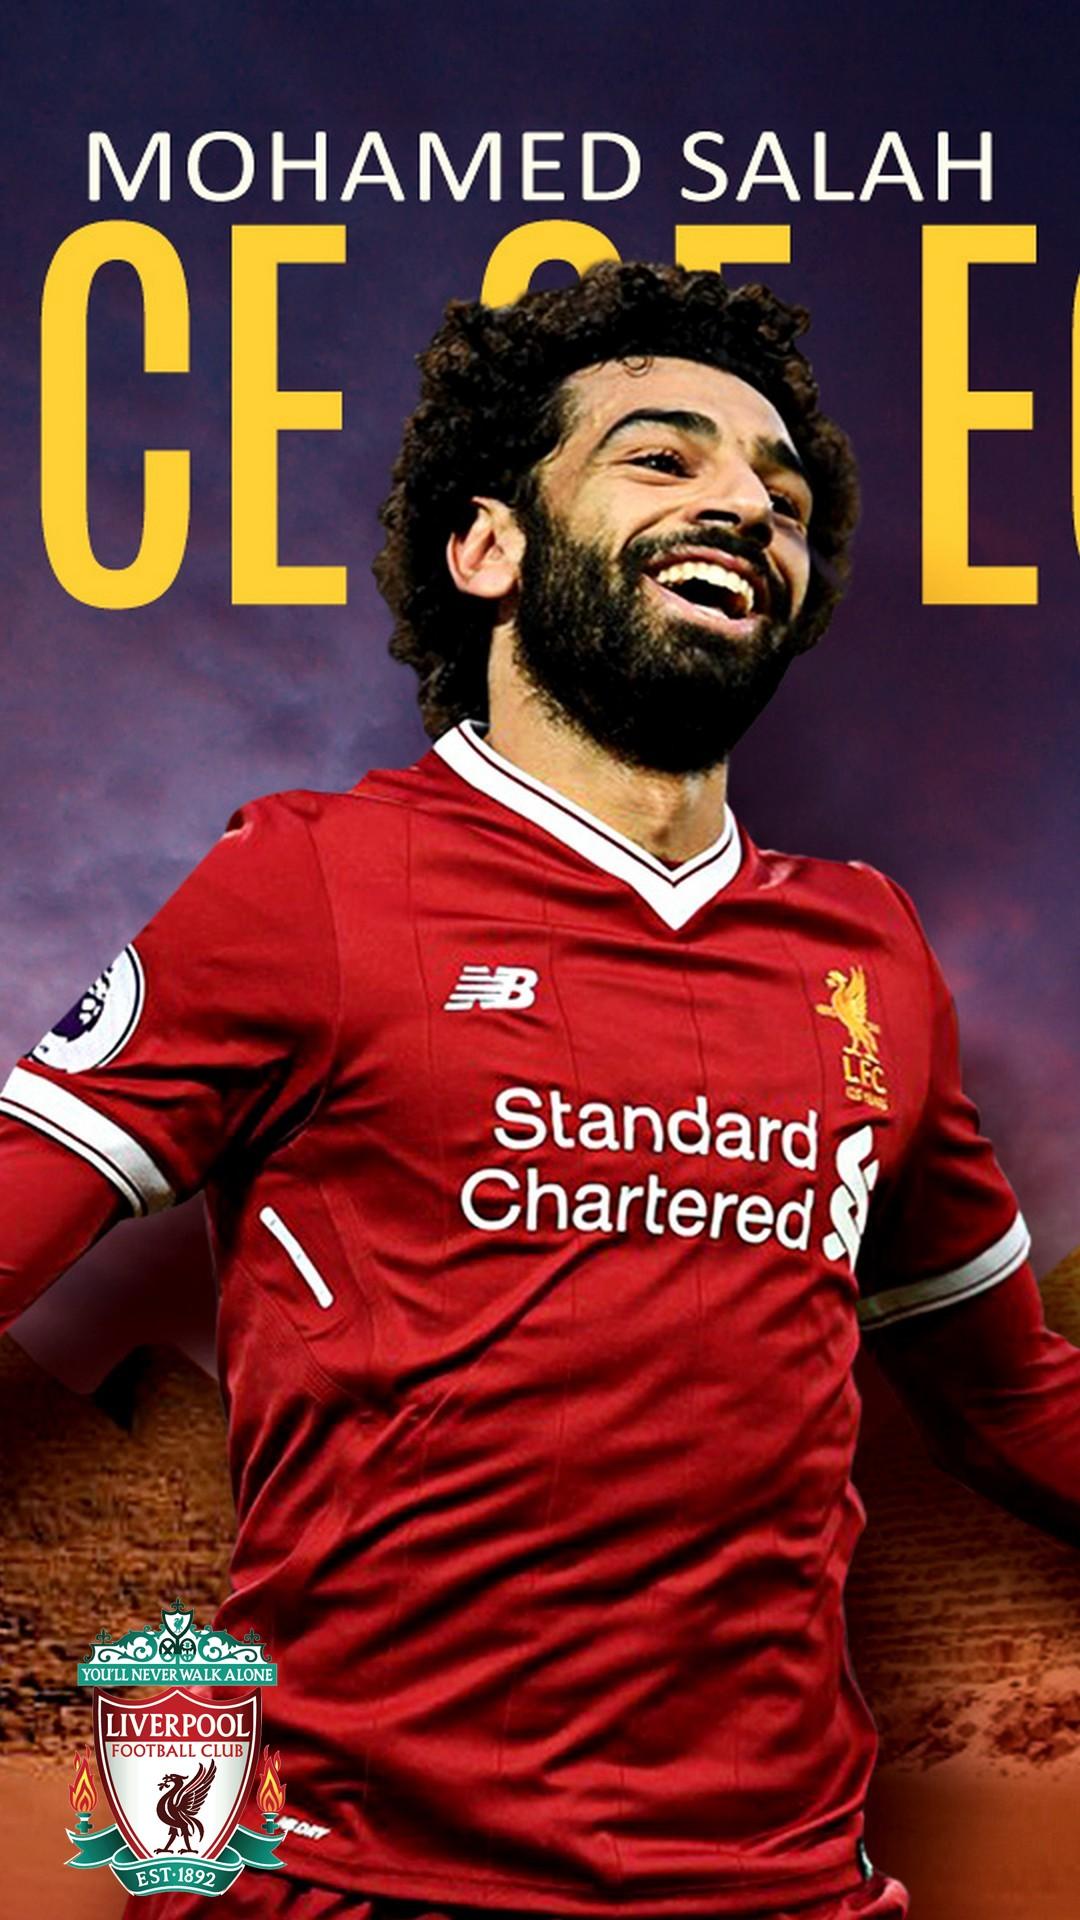 iPhone X Wallpaper Mohamed Salah Liverpool 2019 3D iPhone Wallpaper 1080x1920